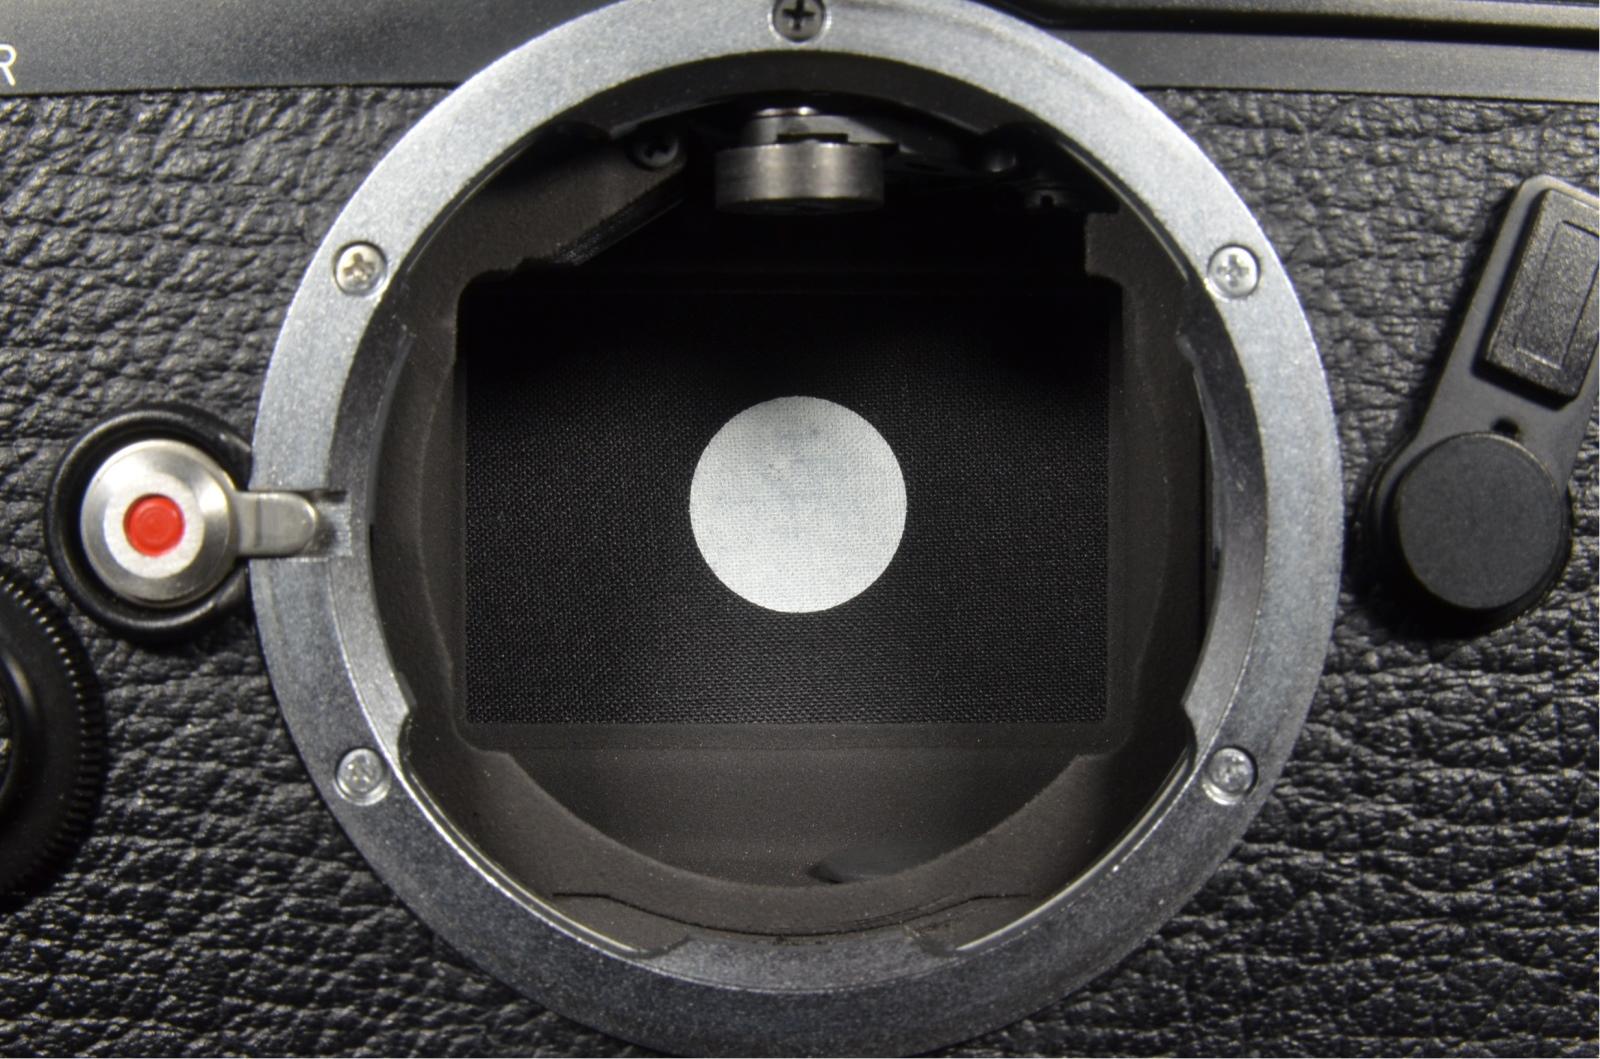 leica m6 0.72 black rangefinder serial no.1689478 year 1986 with case